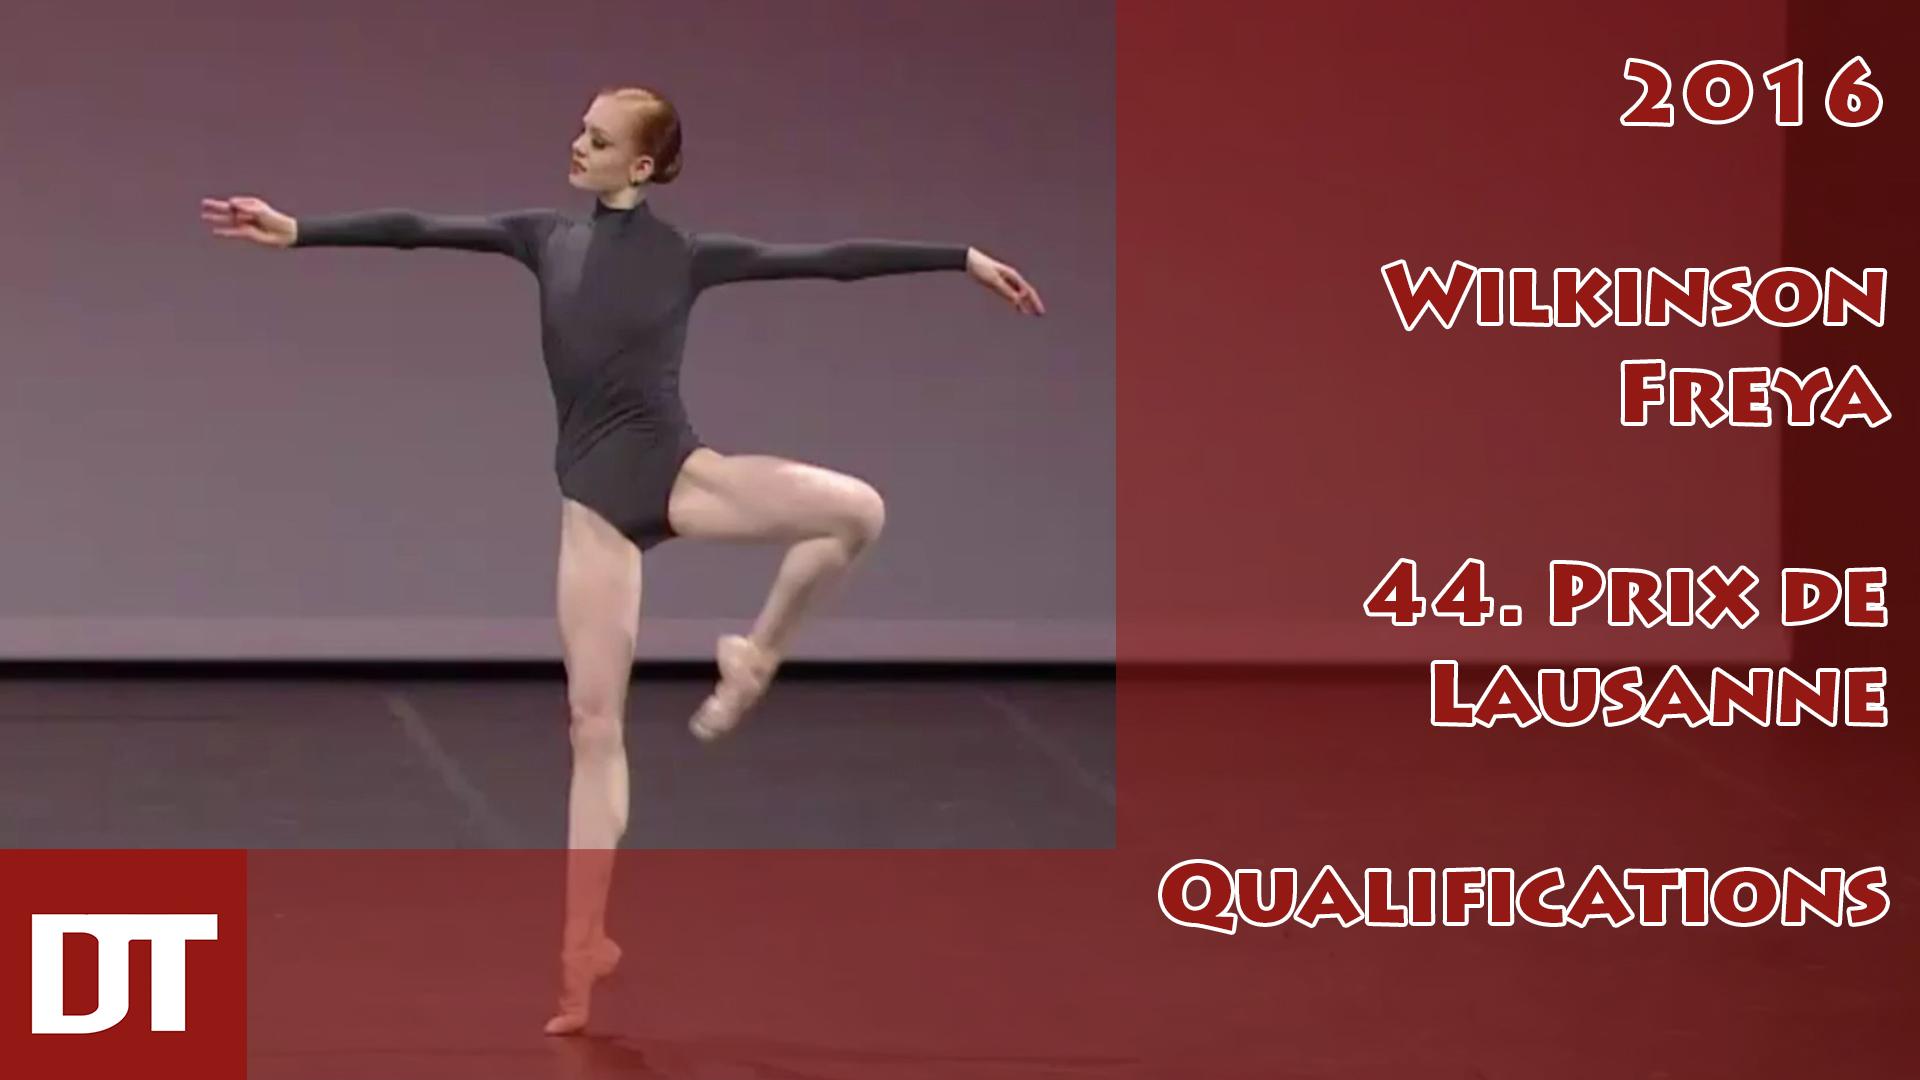 2016 – Wilkinson Freya – 44. Prix de Lausanne – Qualifications